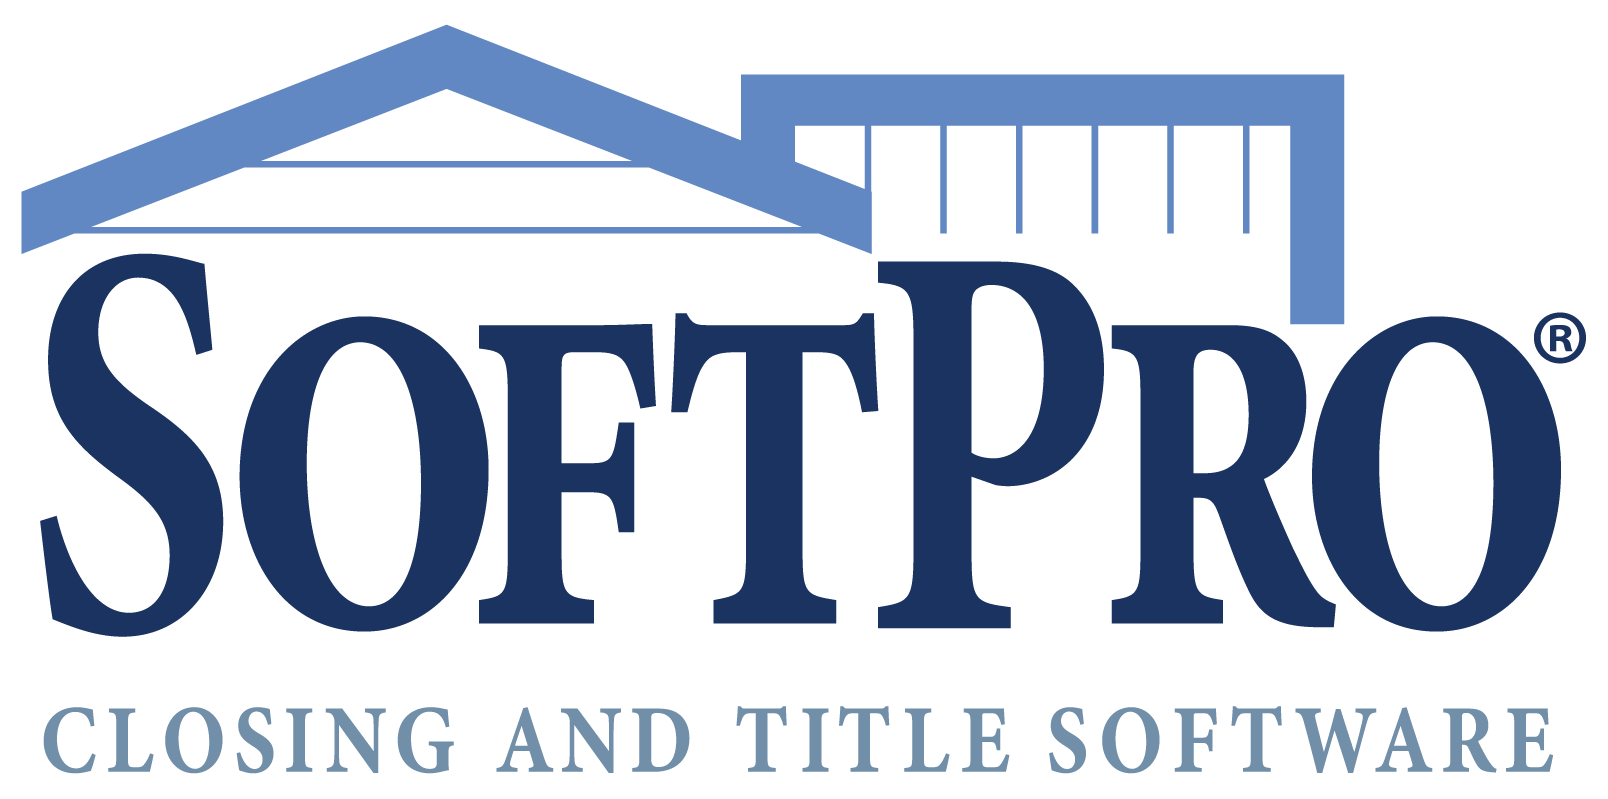 logo_softpro.png